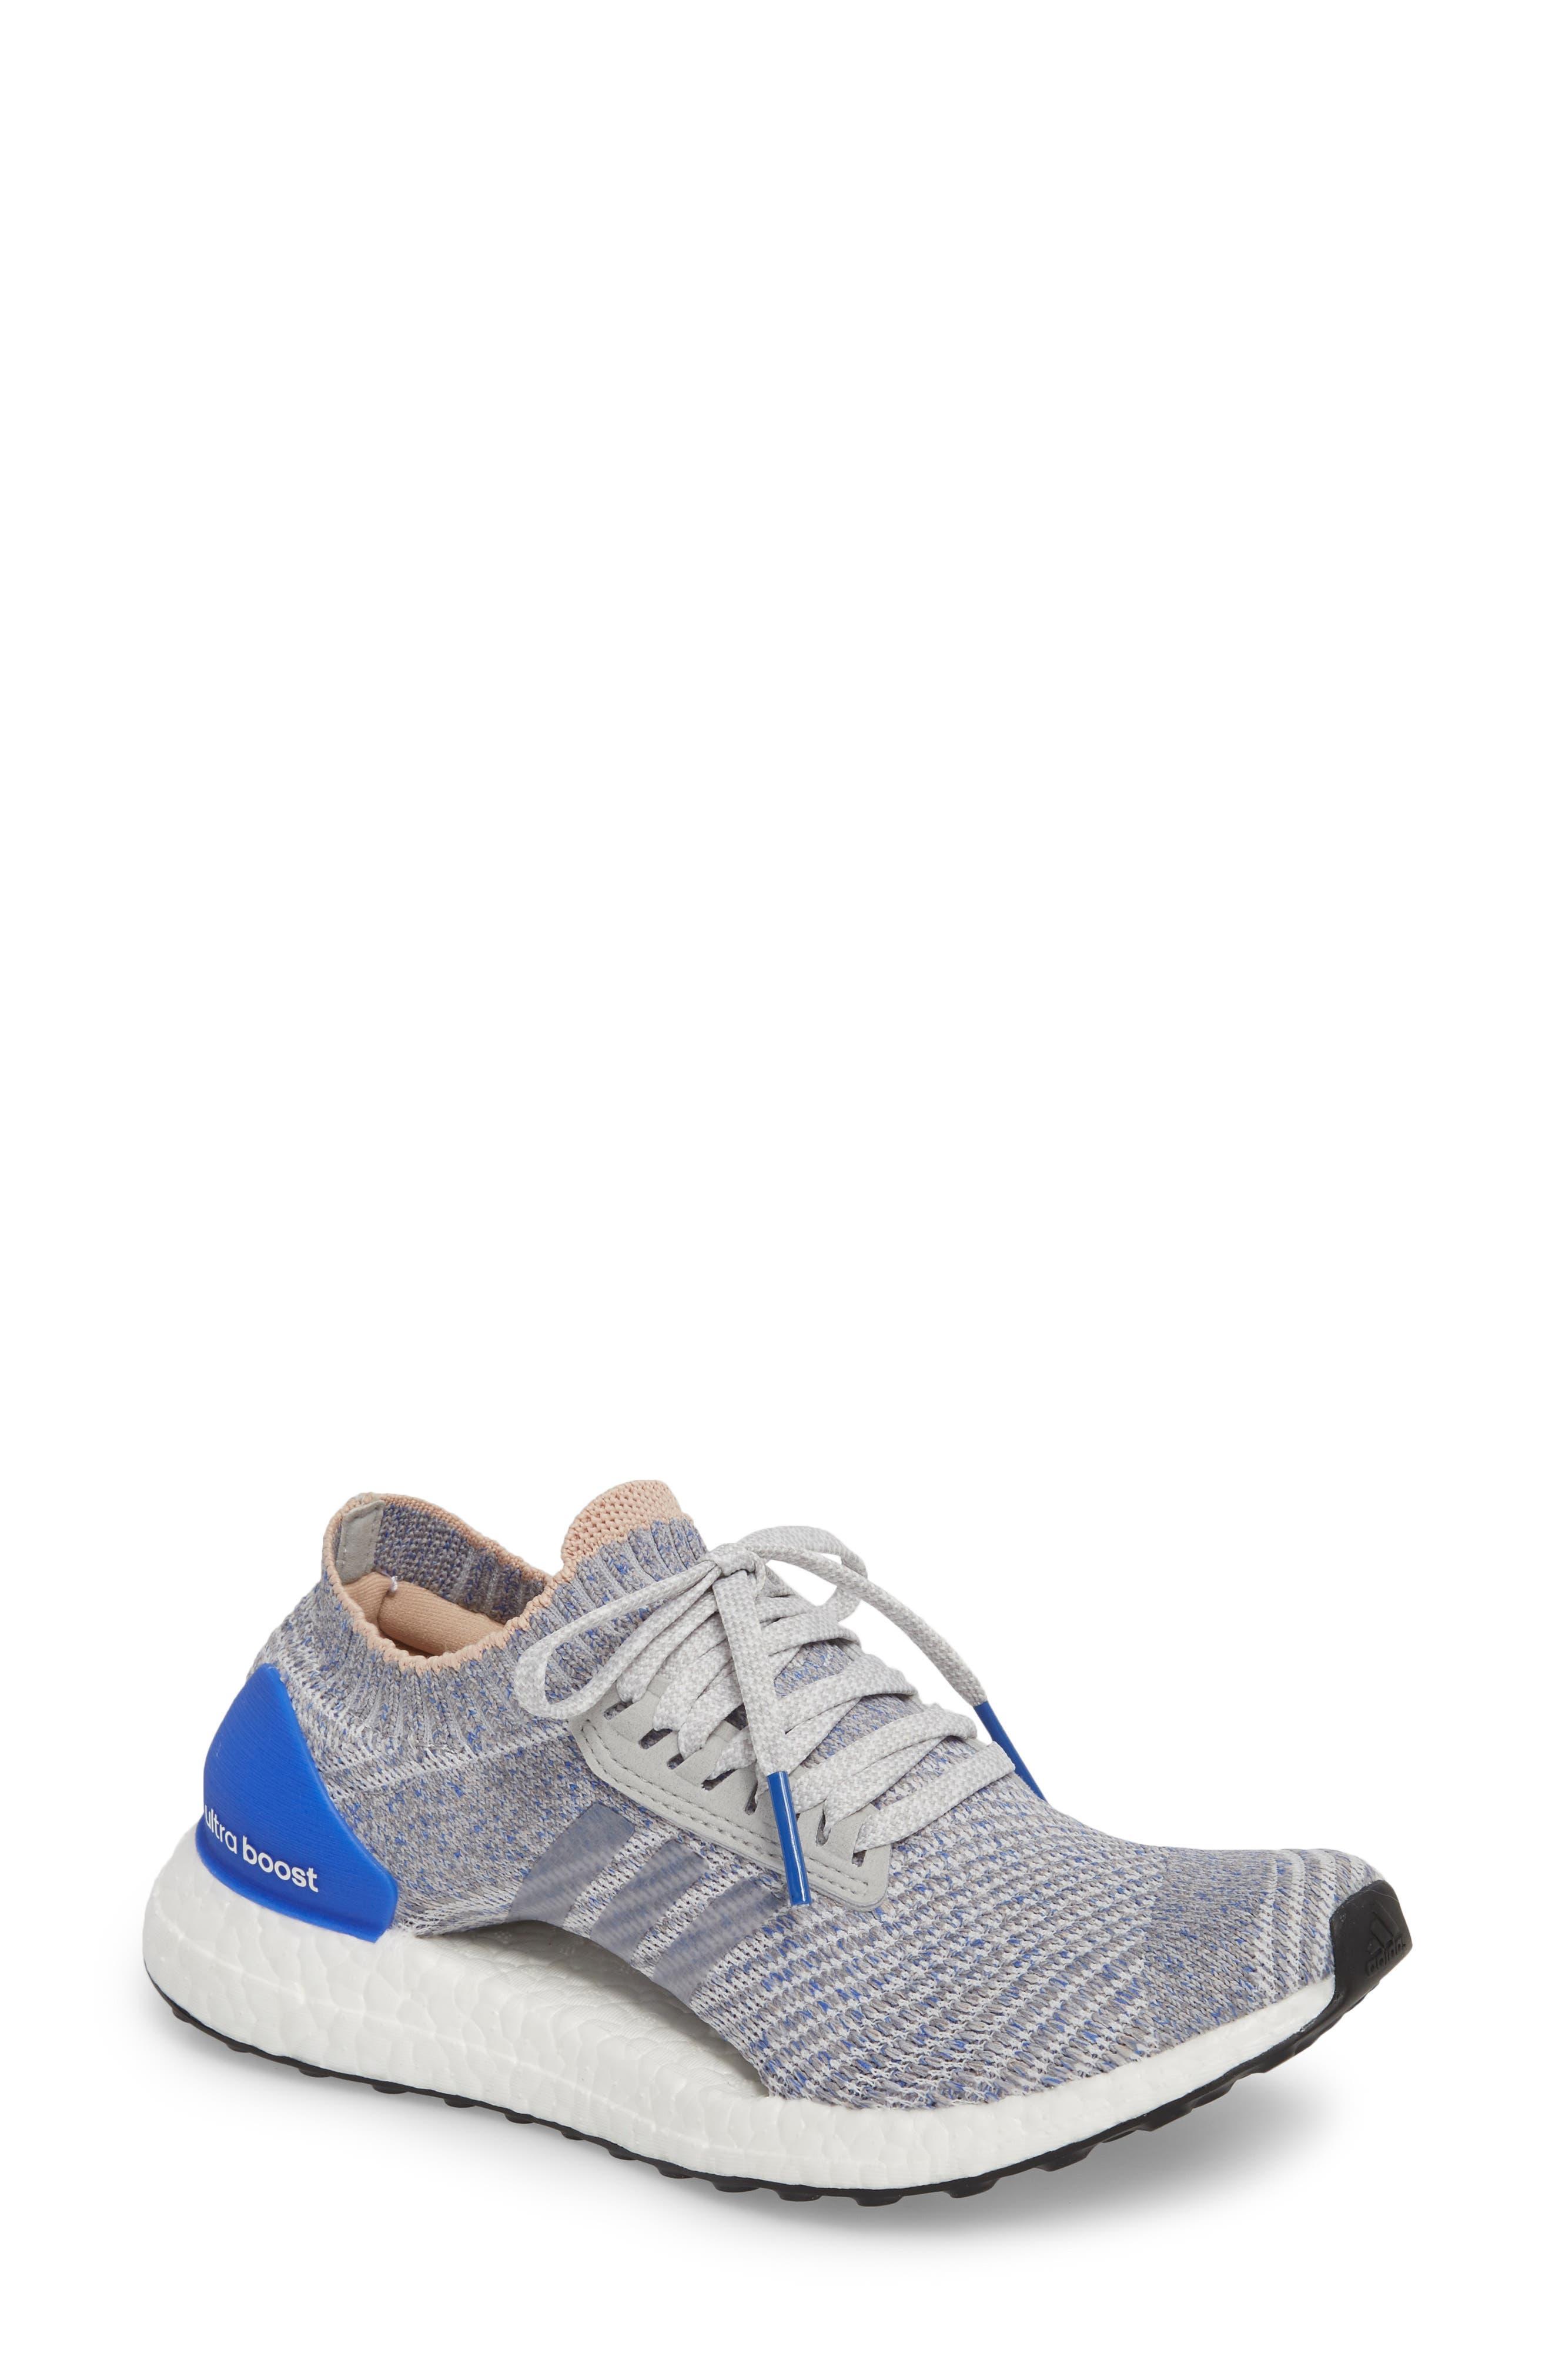 Alternate Image 1 Selected - adidas UltraBoost X Sneaker (Women)